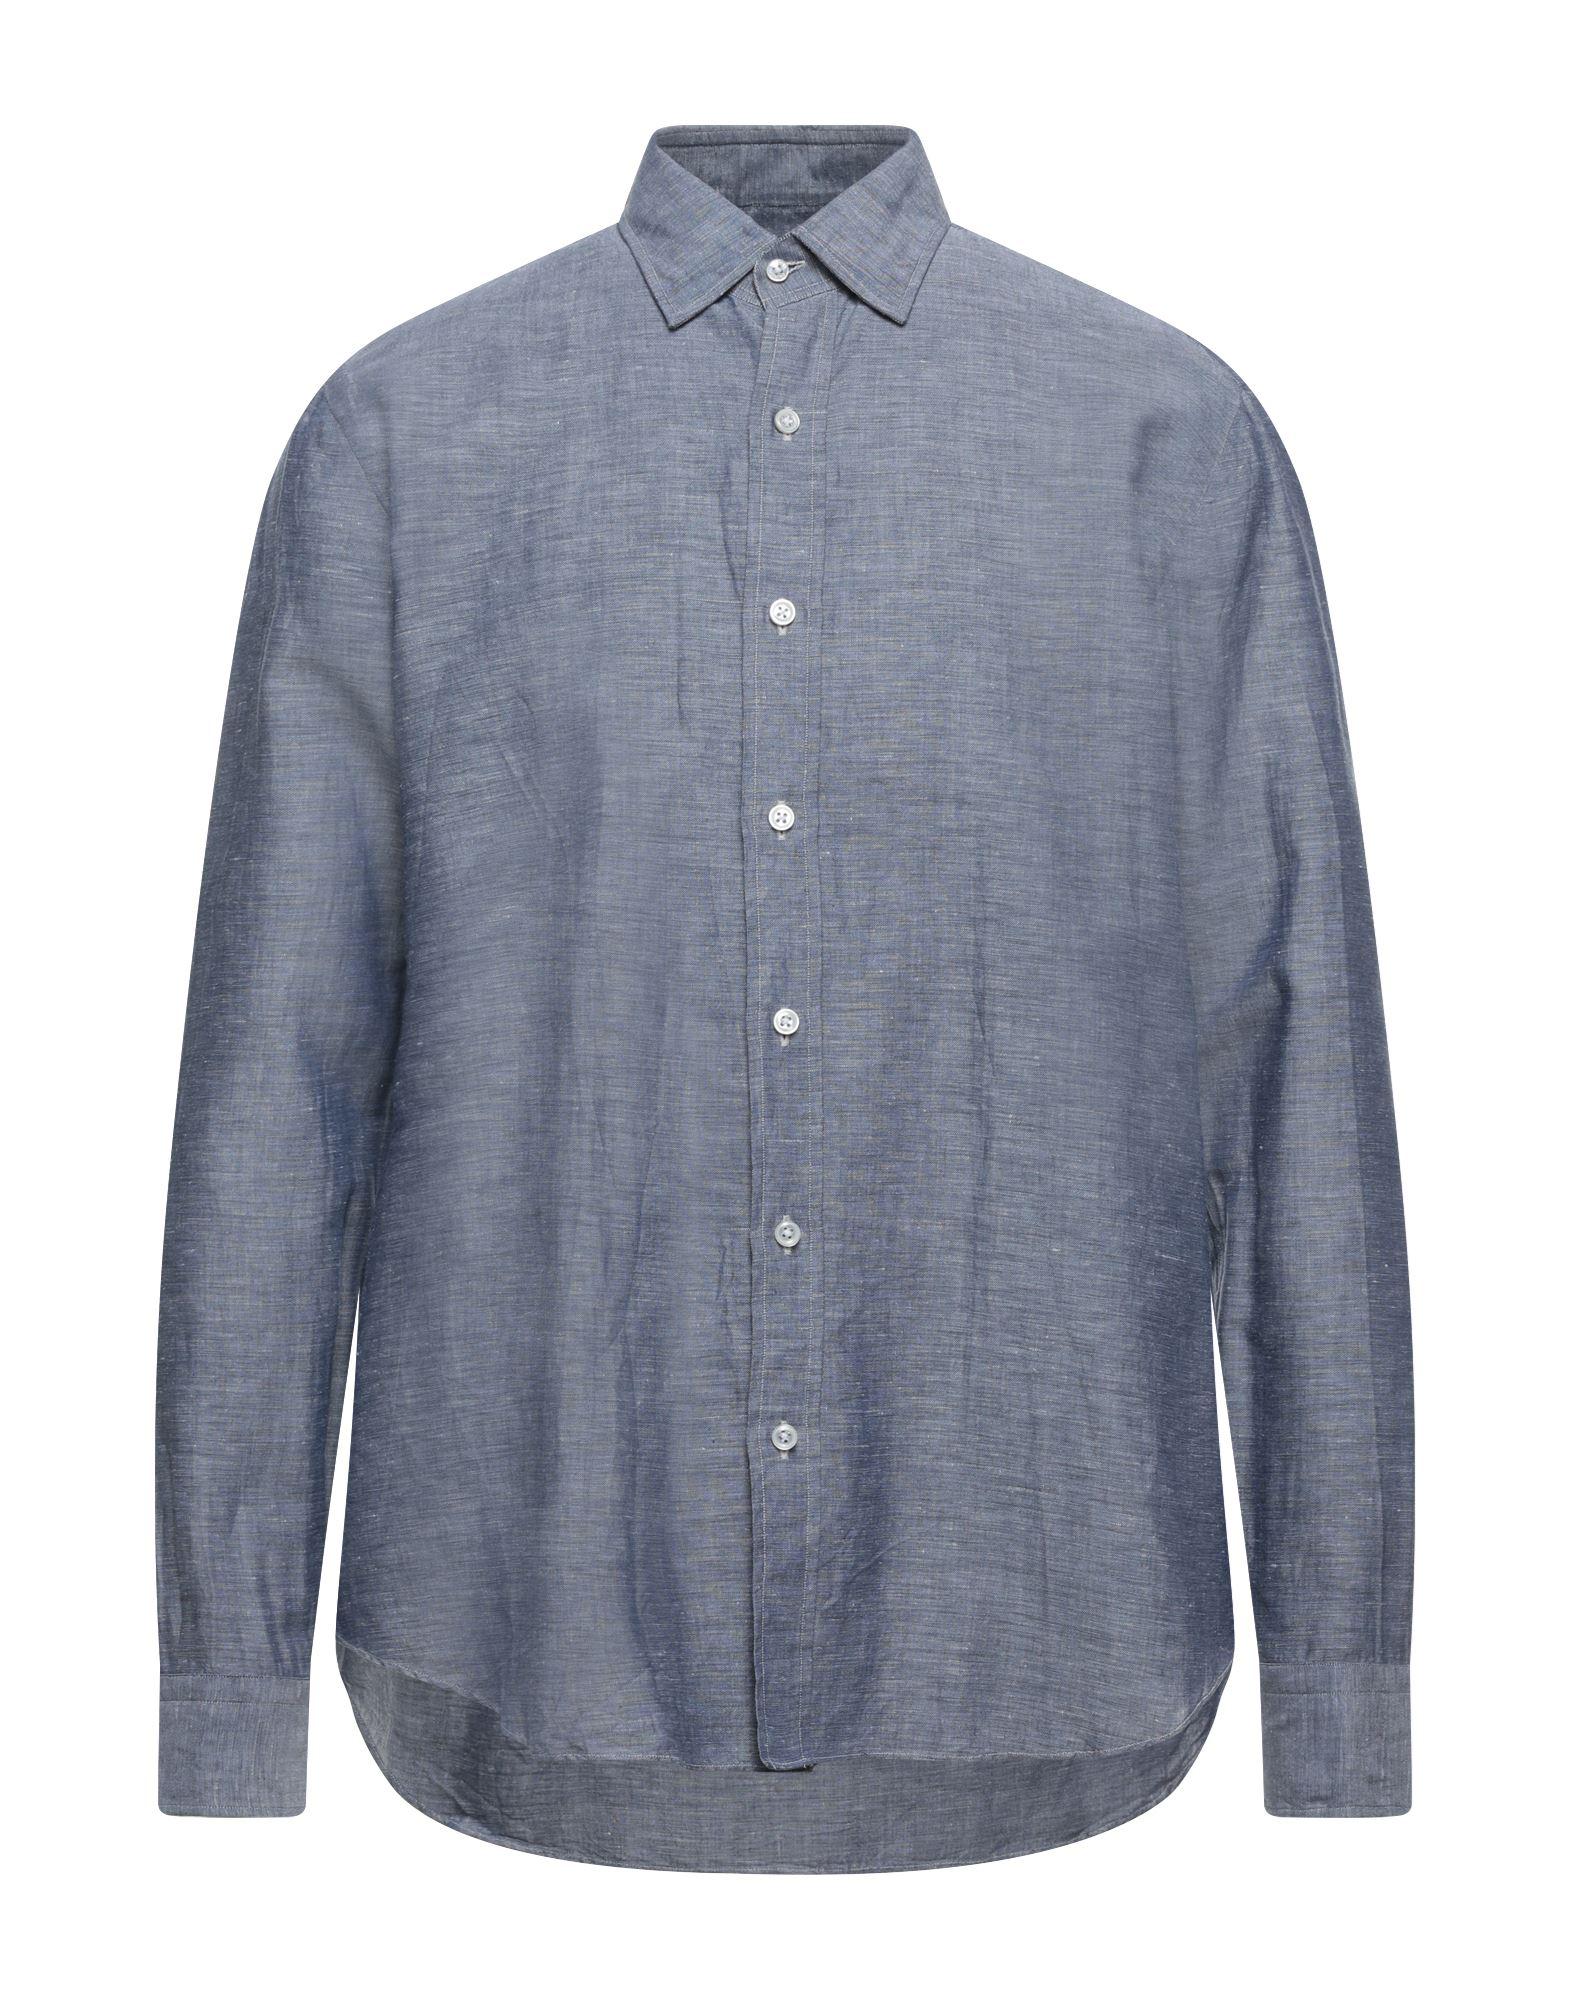 Salvatore Piccolo Shirts SHIRTS